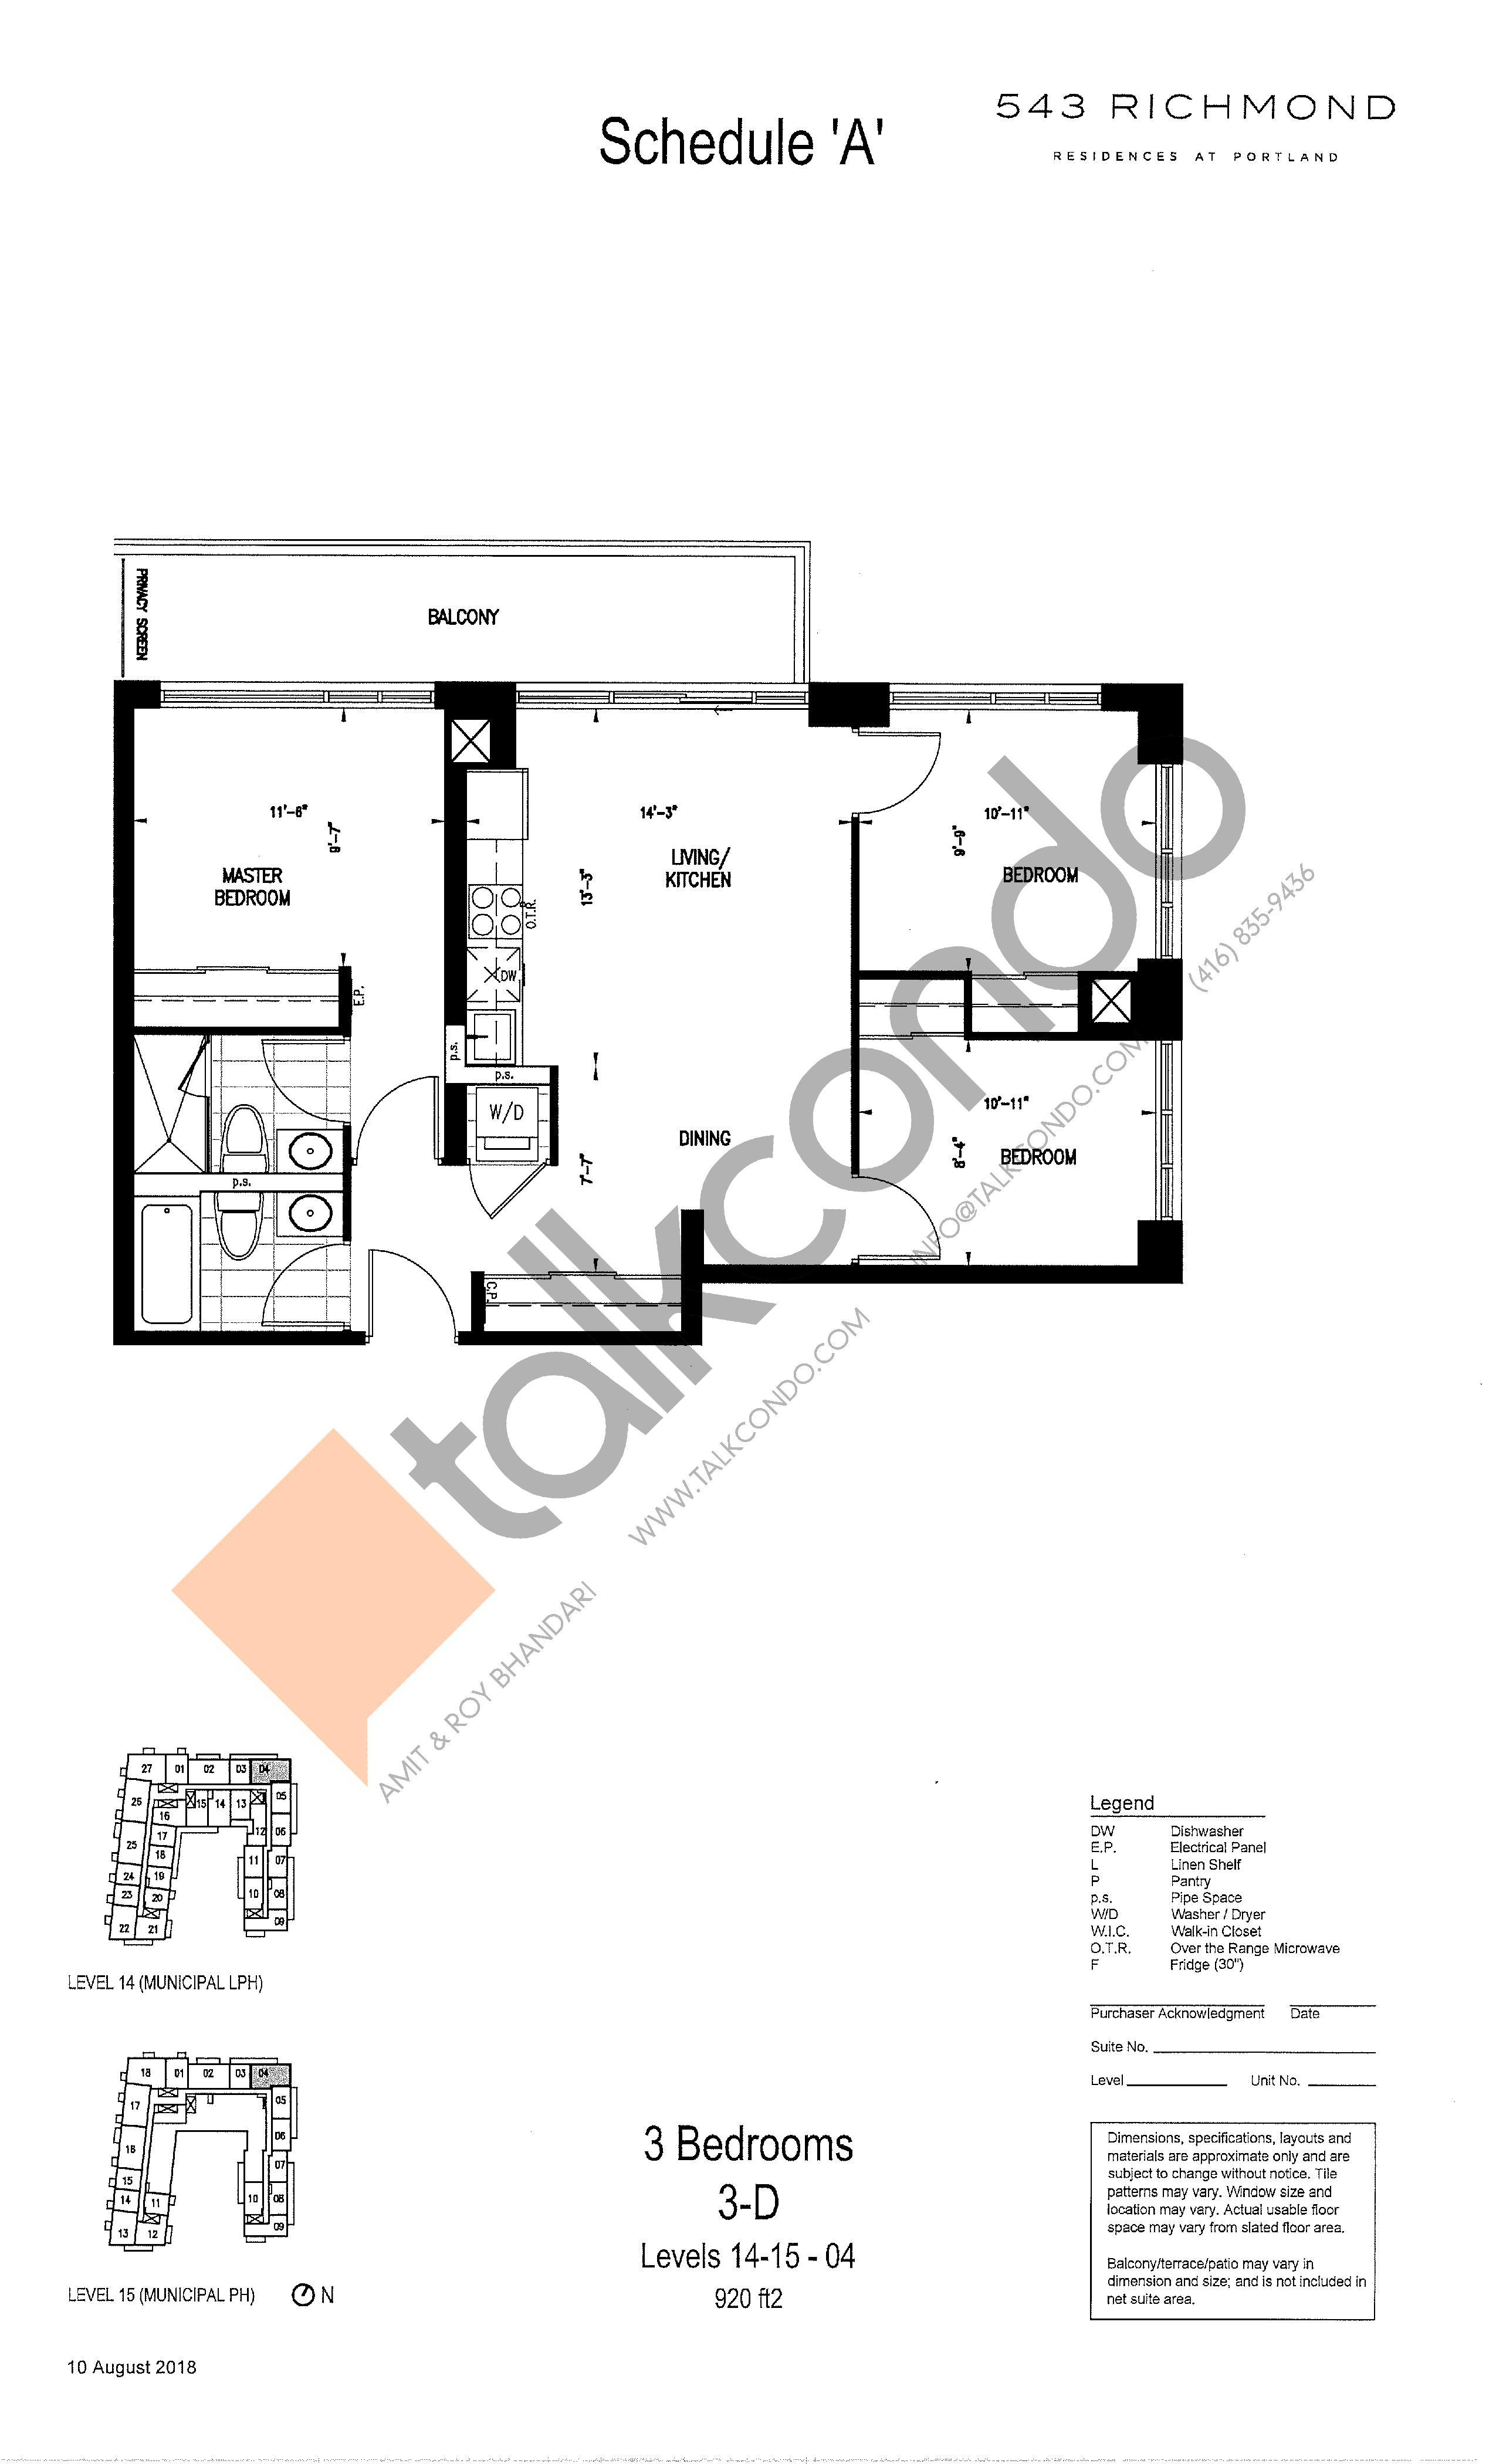 3-D Floor Plan at 543 Richmond St Condos - 920 sq.ft